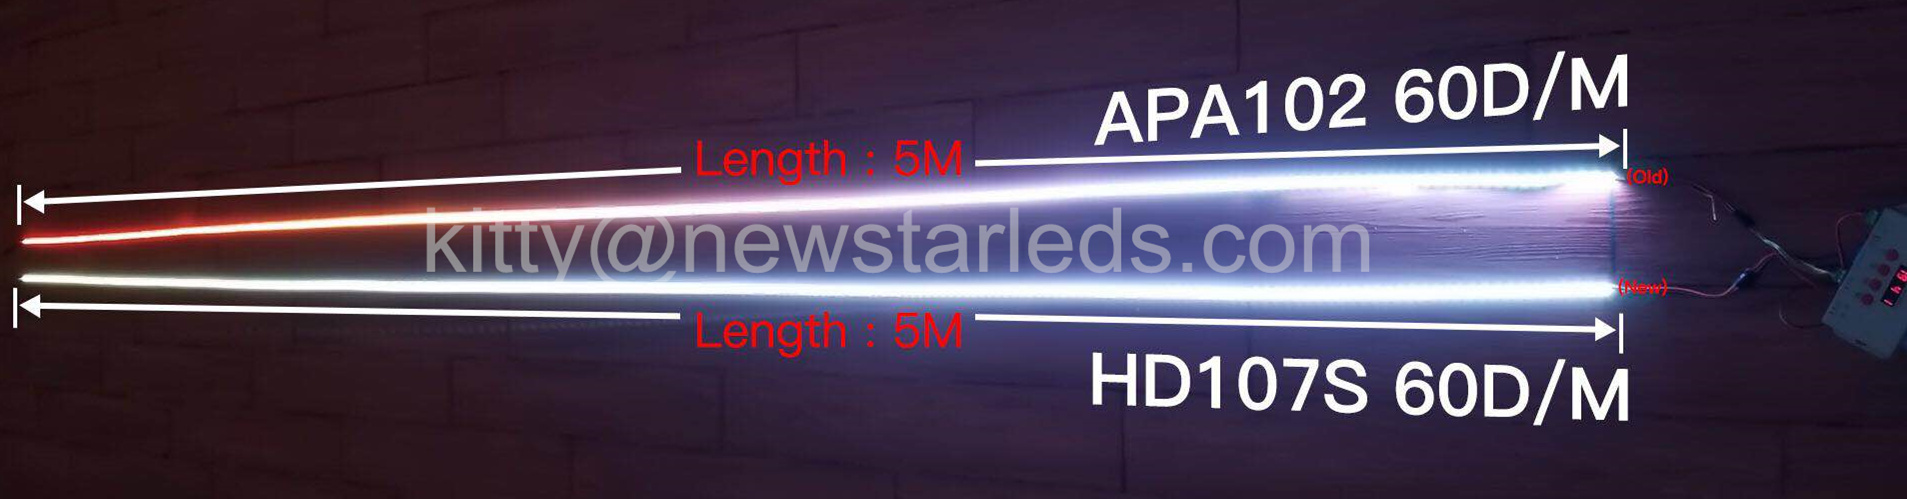 APA102 LED Strip comparing to HD107S LED Strip Light.jpg